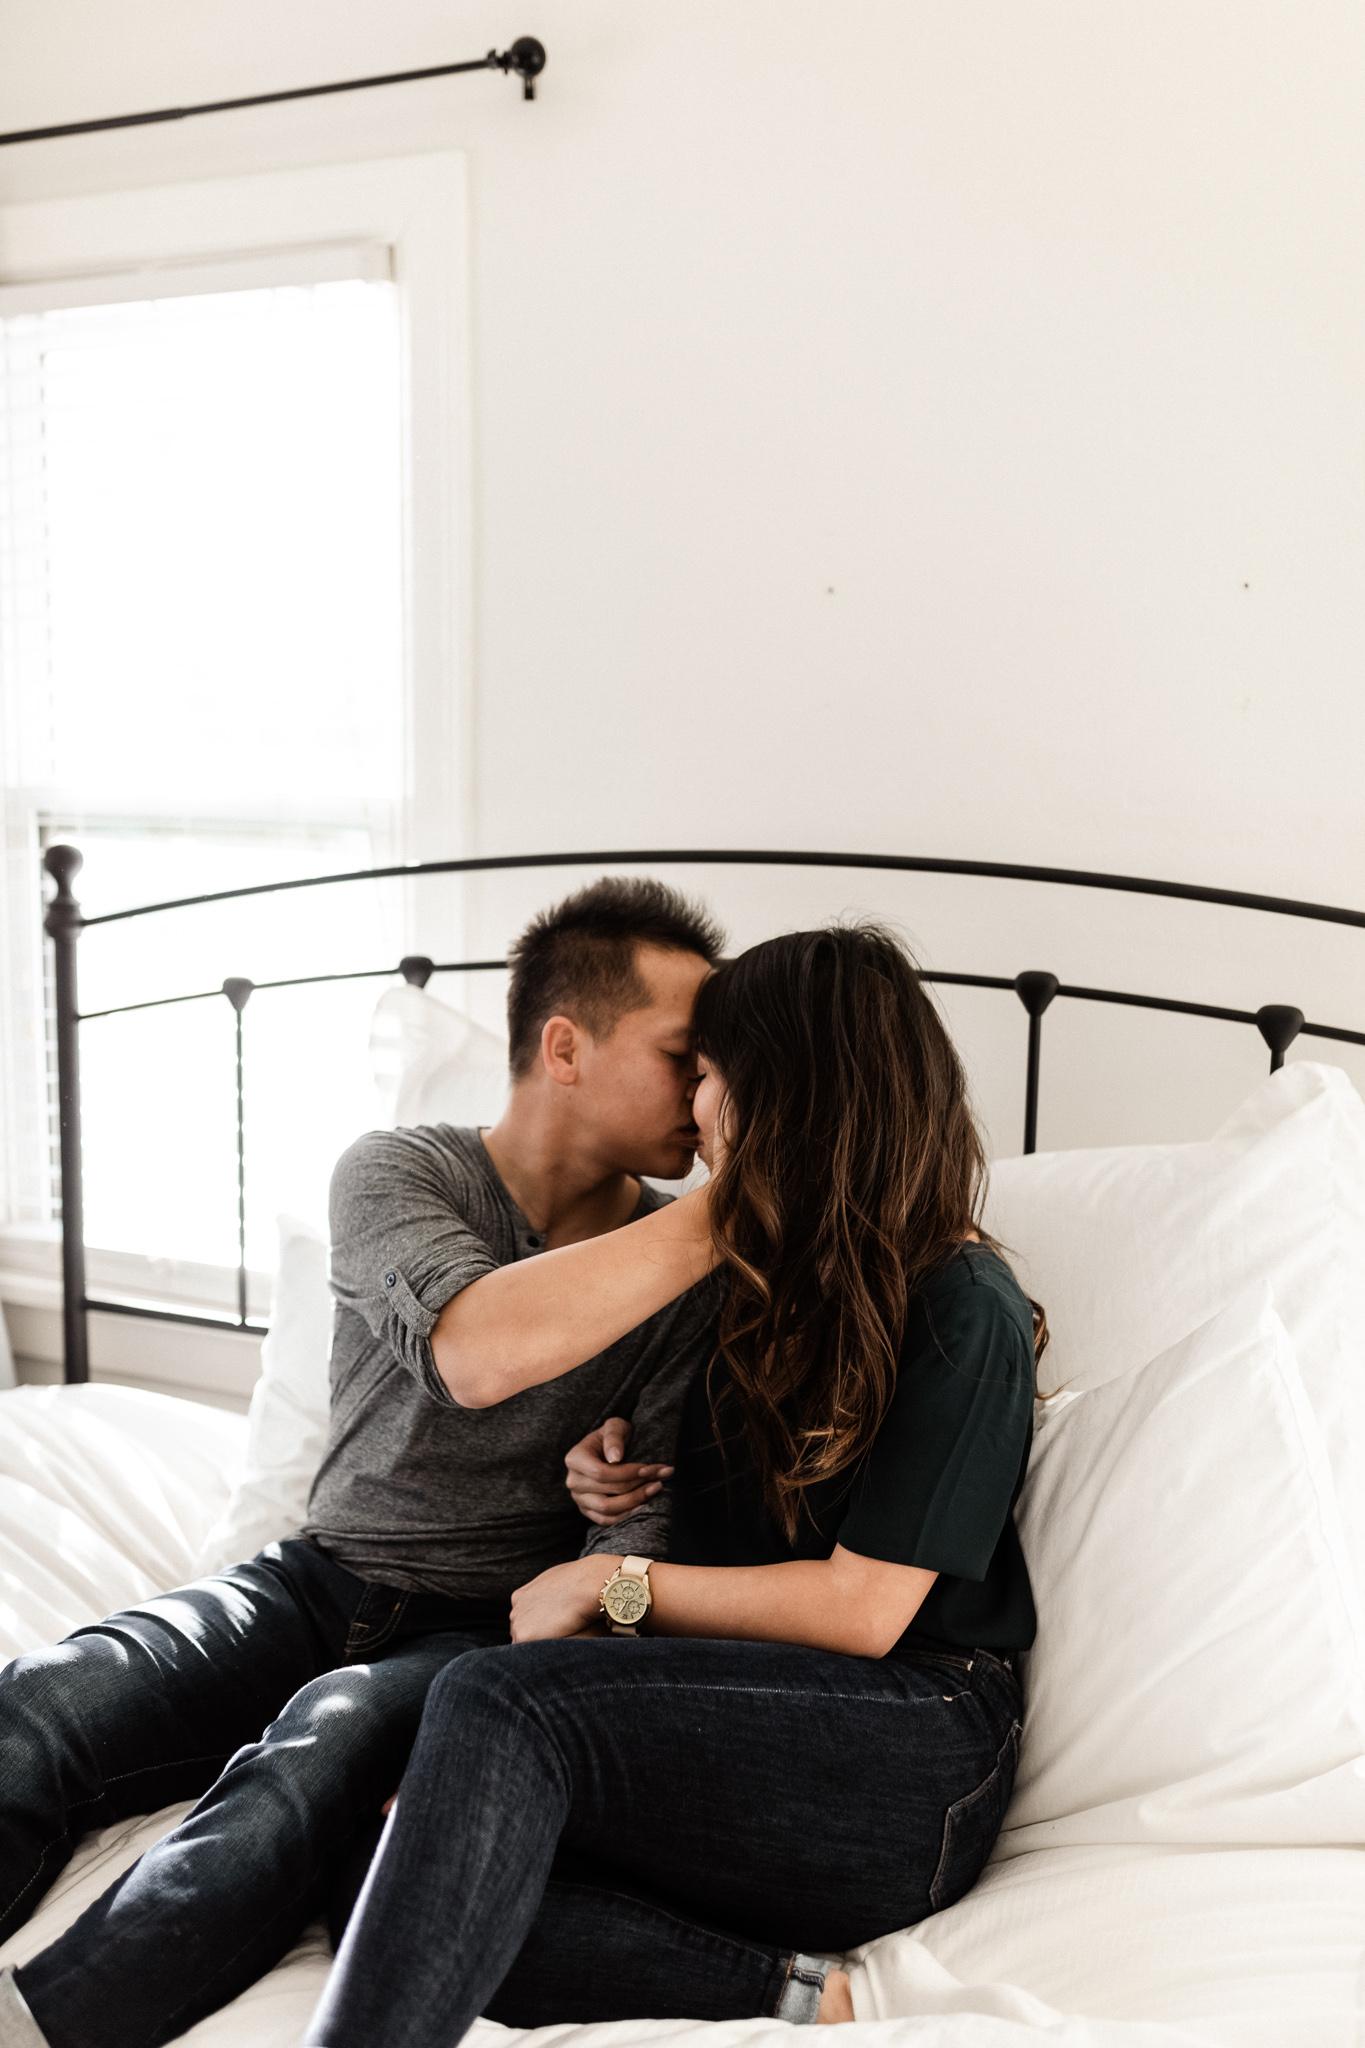 Hieu + Teresa | Colorful Romantic Downtown Engagements | Oklahoma Wedding Photographer-26.jpg